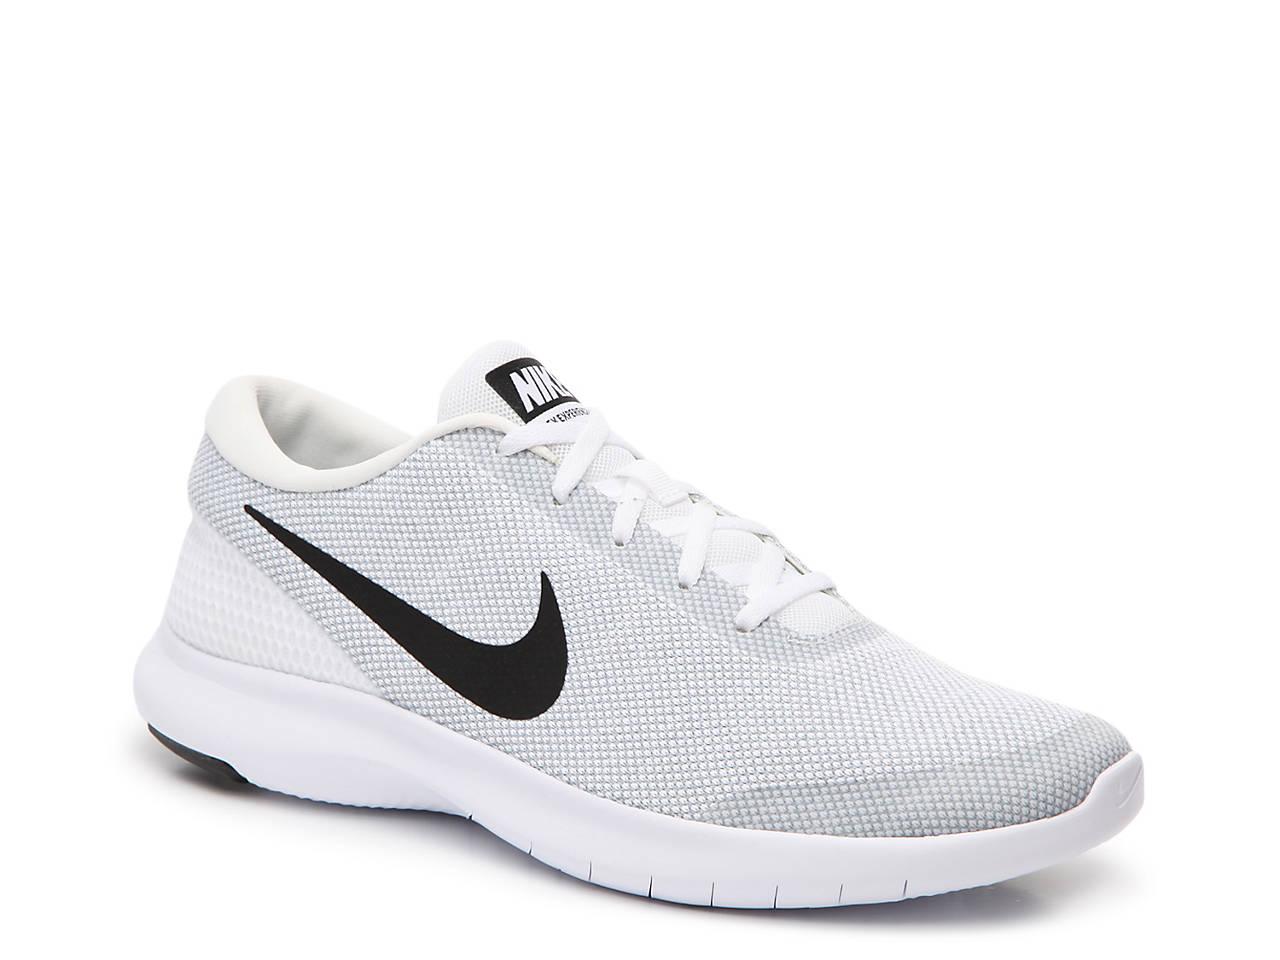 ... Nike Mens Flex Run Lightweight Running Shoe Lightweight Athletic Mens  Shoes - DSW; Flex Experience RN 7 Running Shoe - Mens ...